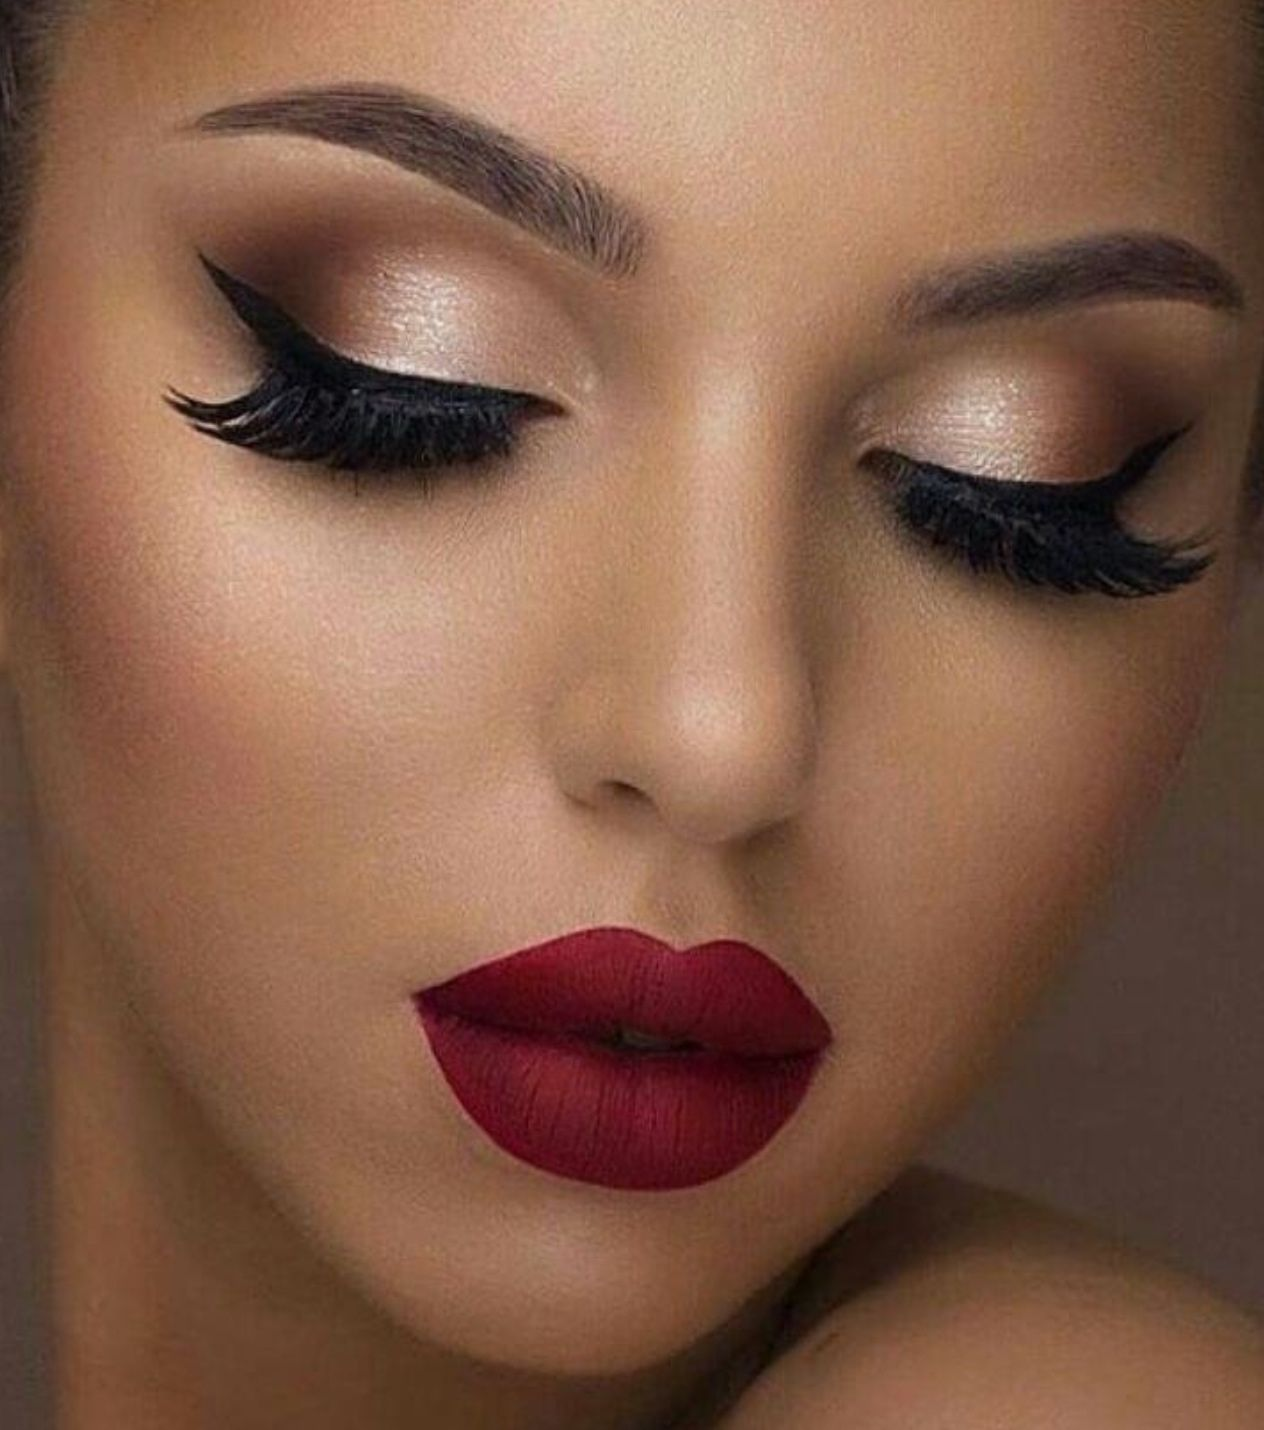 Beauty Salon Today Prom makeup looks, Eye makeup, Glam